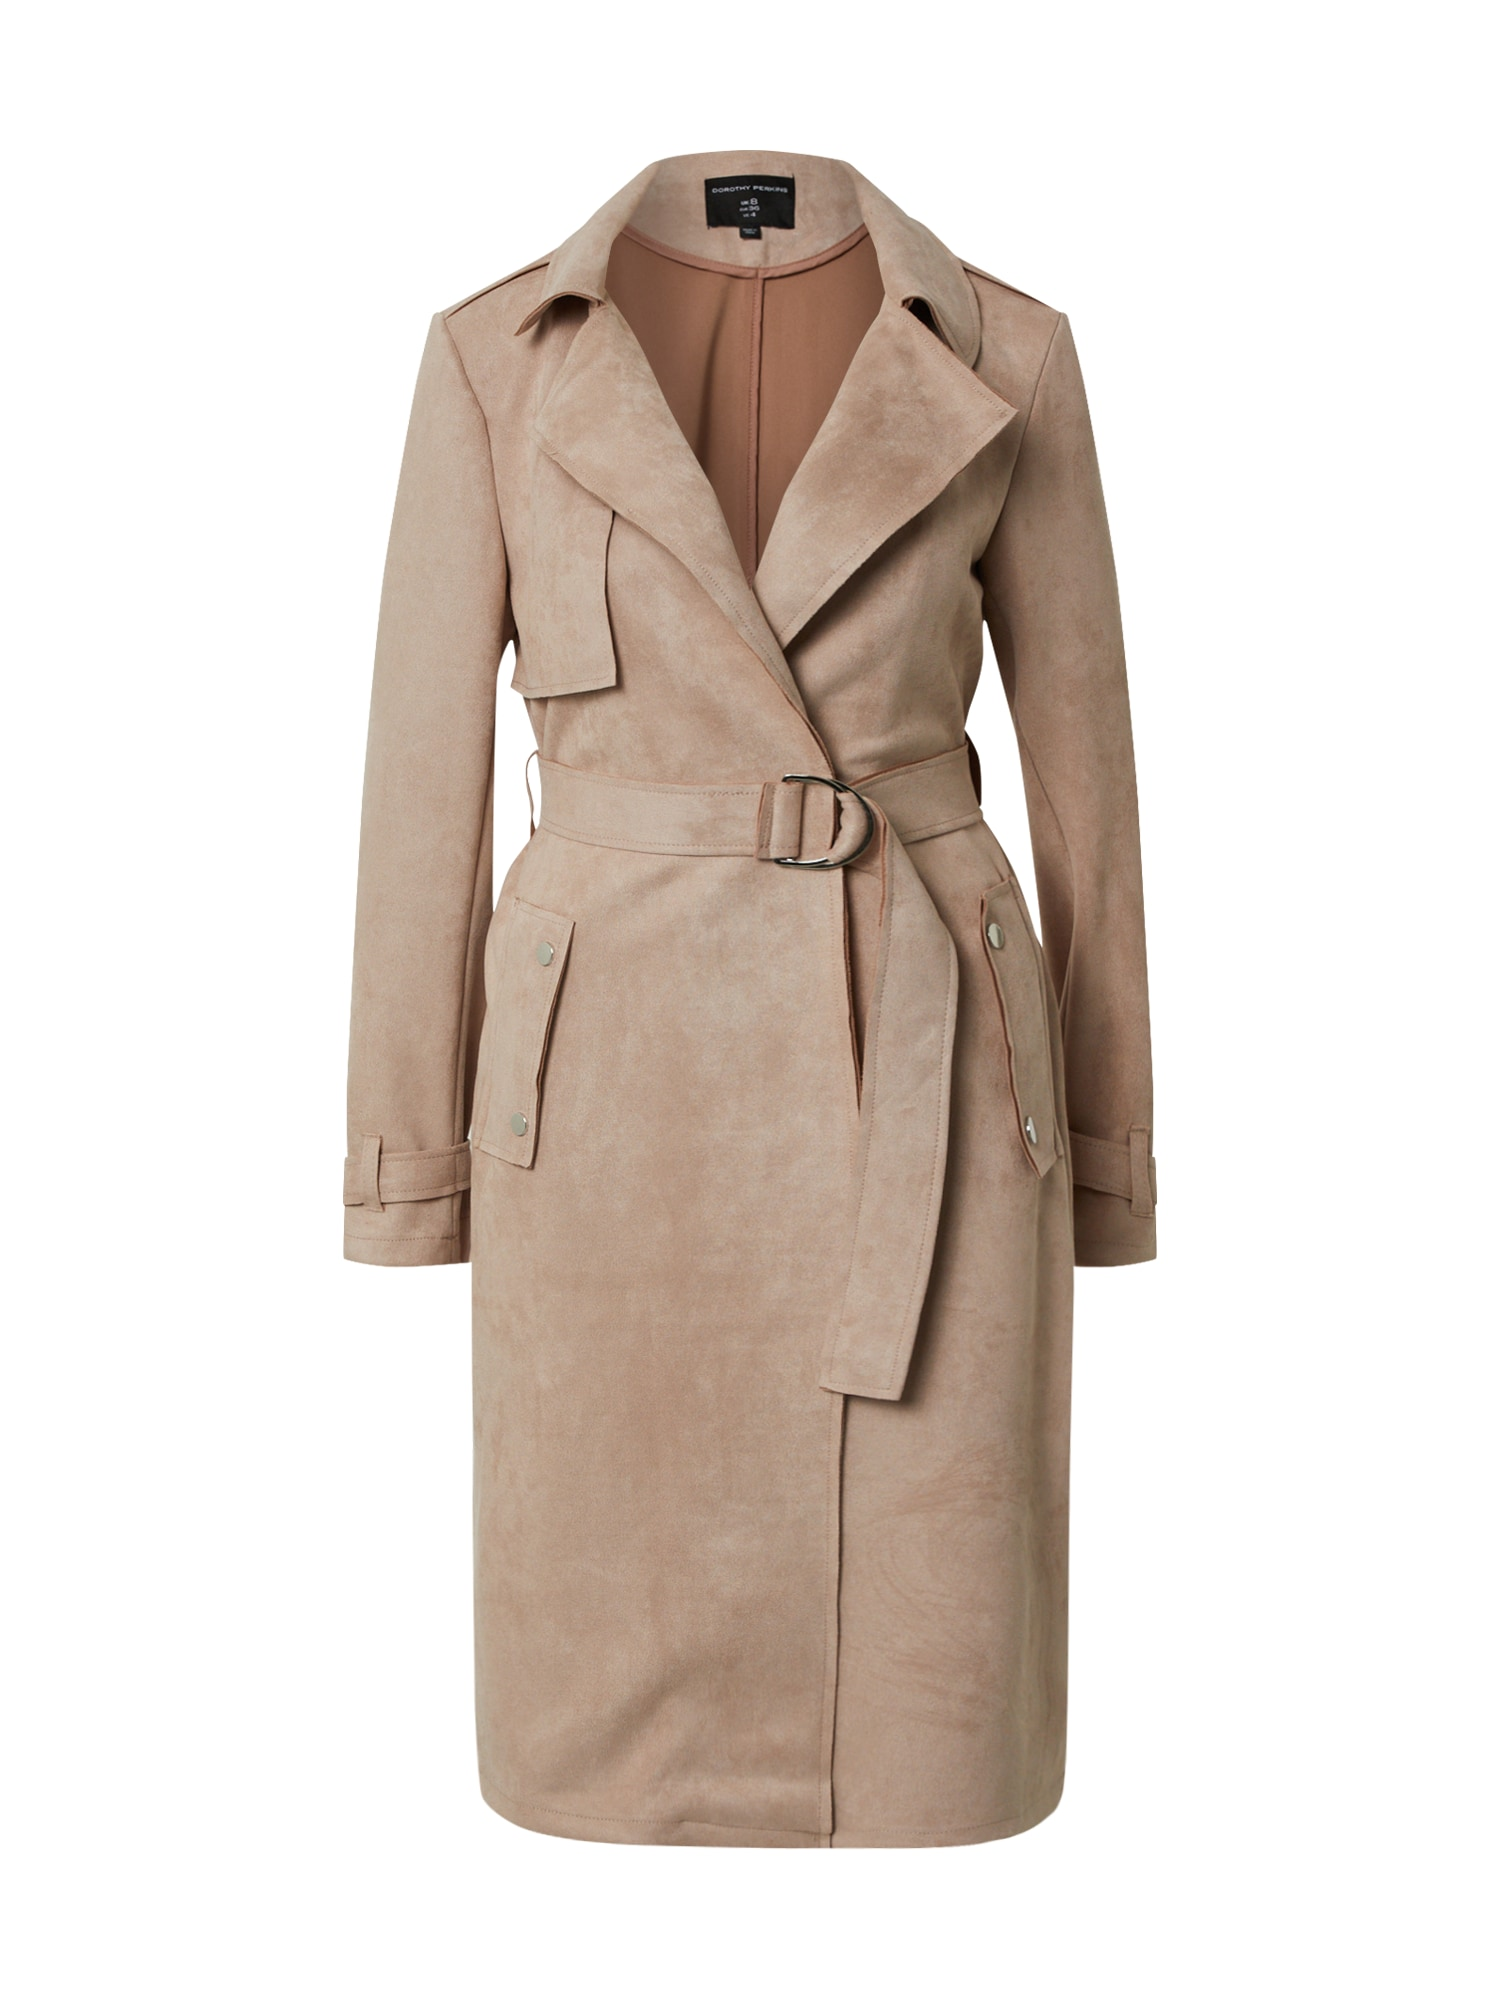 Dorothy Perkins Rudeninis-žieminis paltas 'Blush Suedette D-Ring Mac' odos